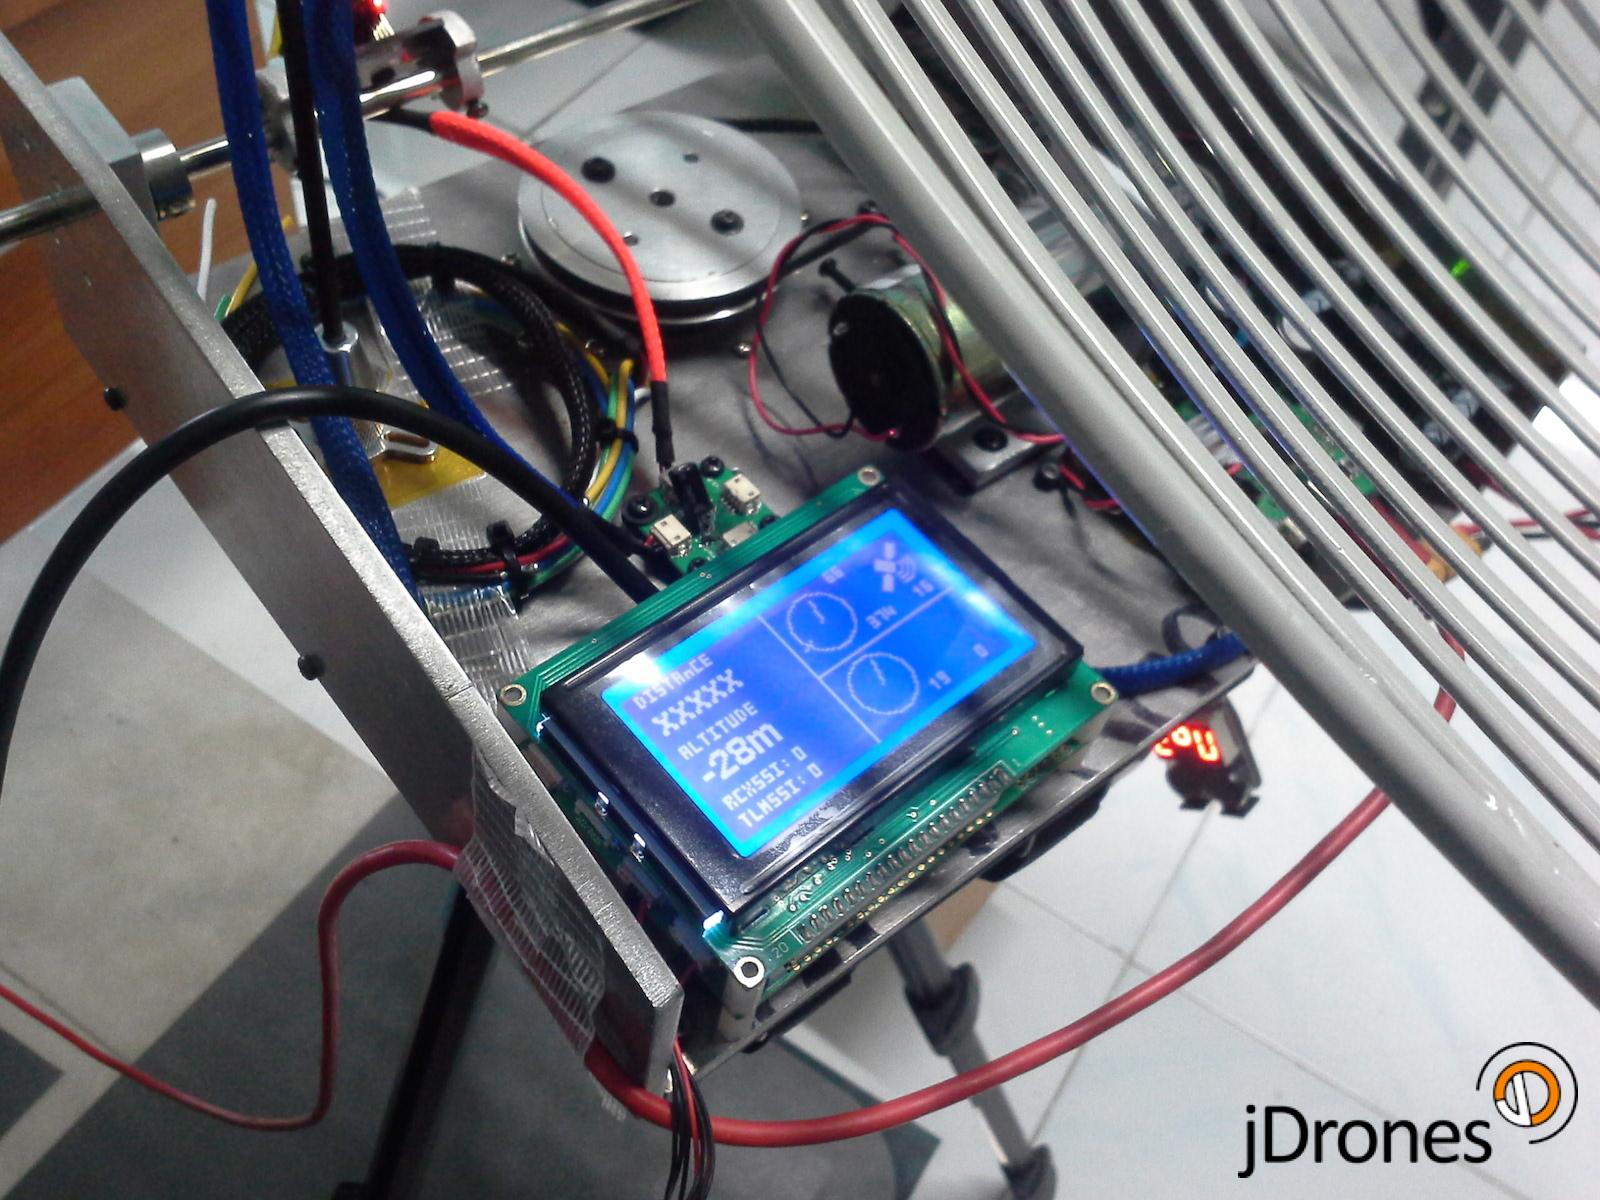 jDrones_Antenna_tracker_Development_P2.jpg?width=500